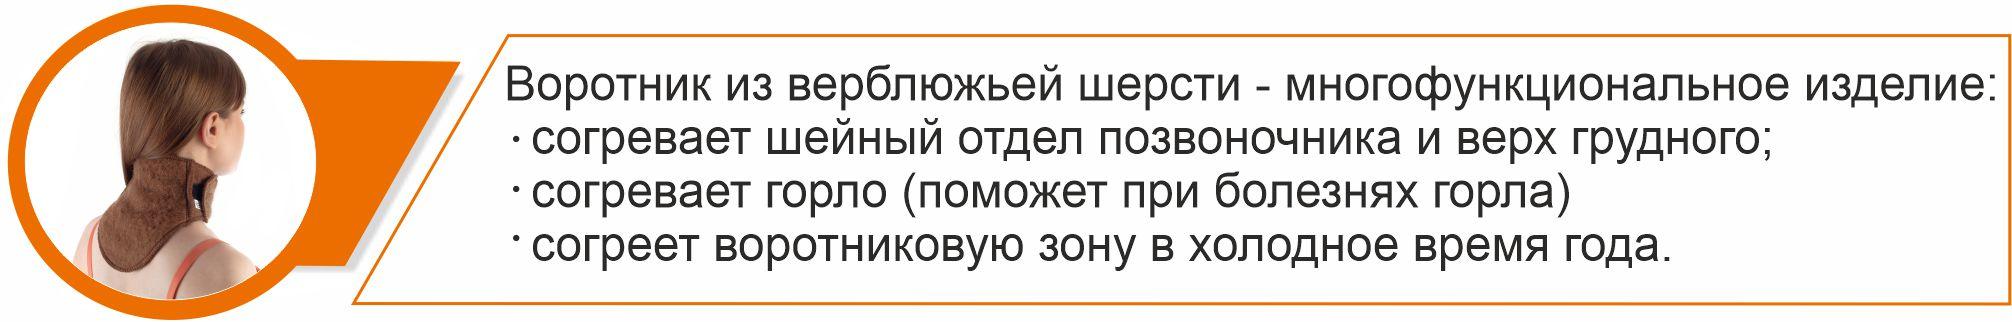 рус. ВШ воротник текст